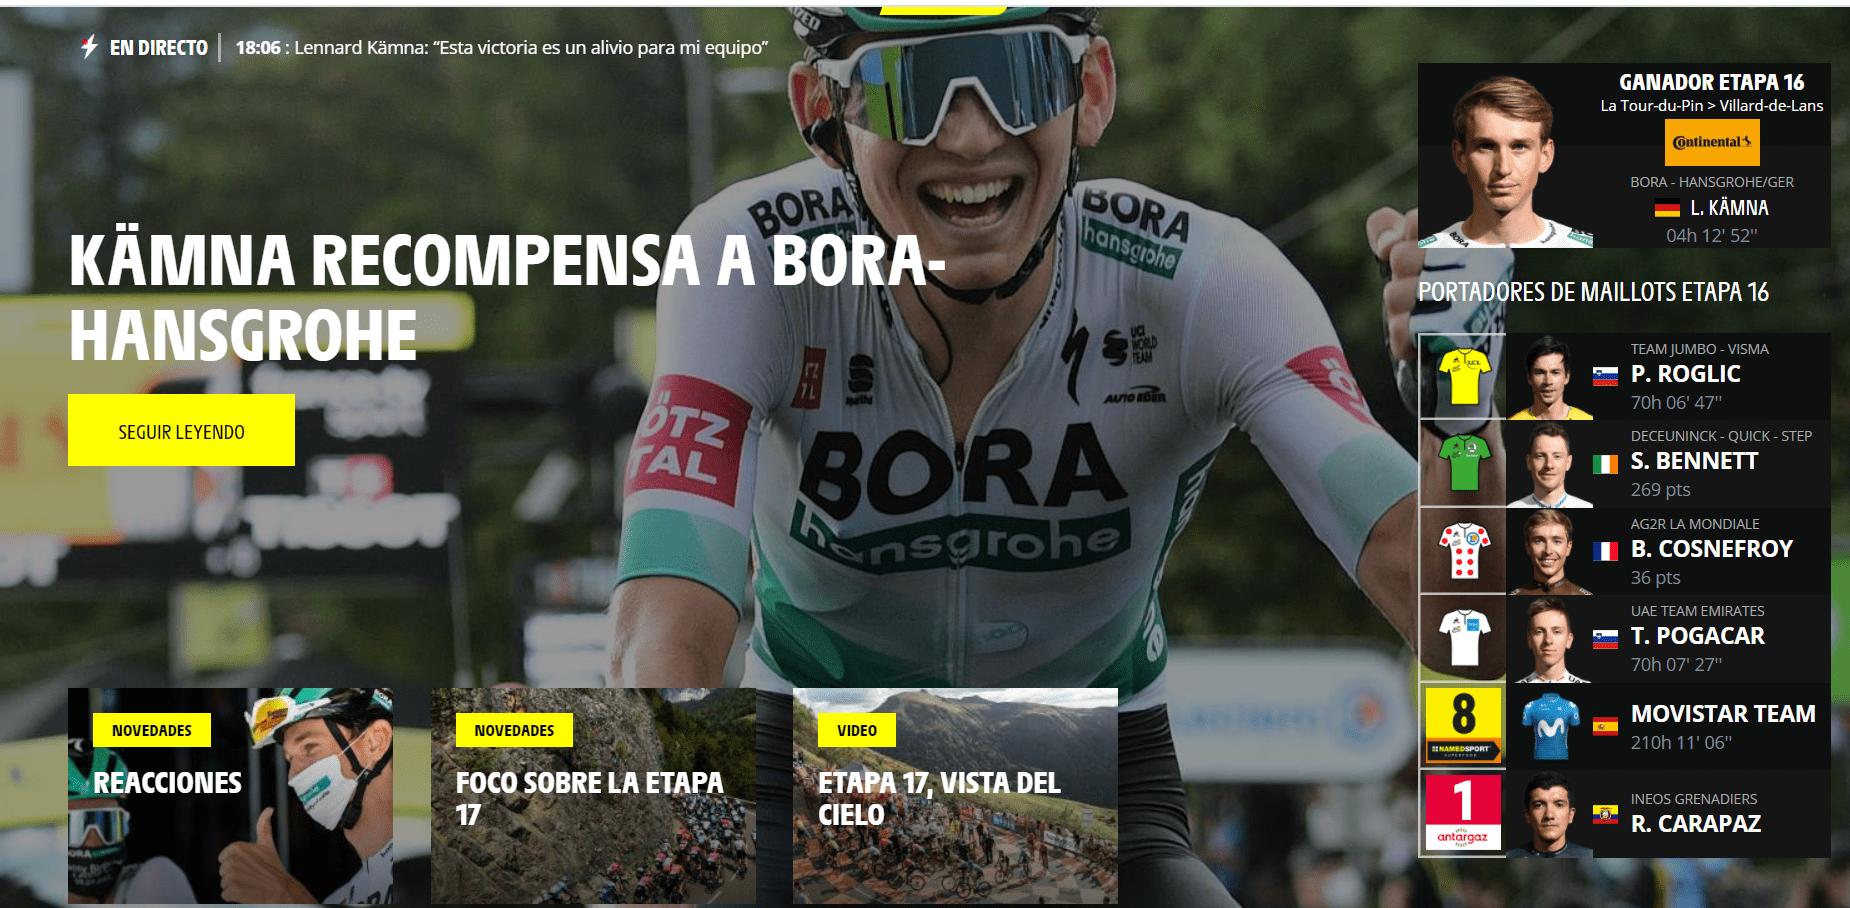 Lennard Kämna doblegó a un ganador del Giro d'Italia Richard Carapaz